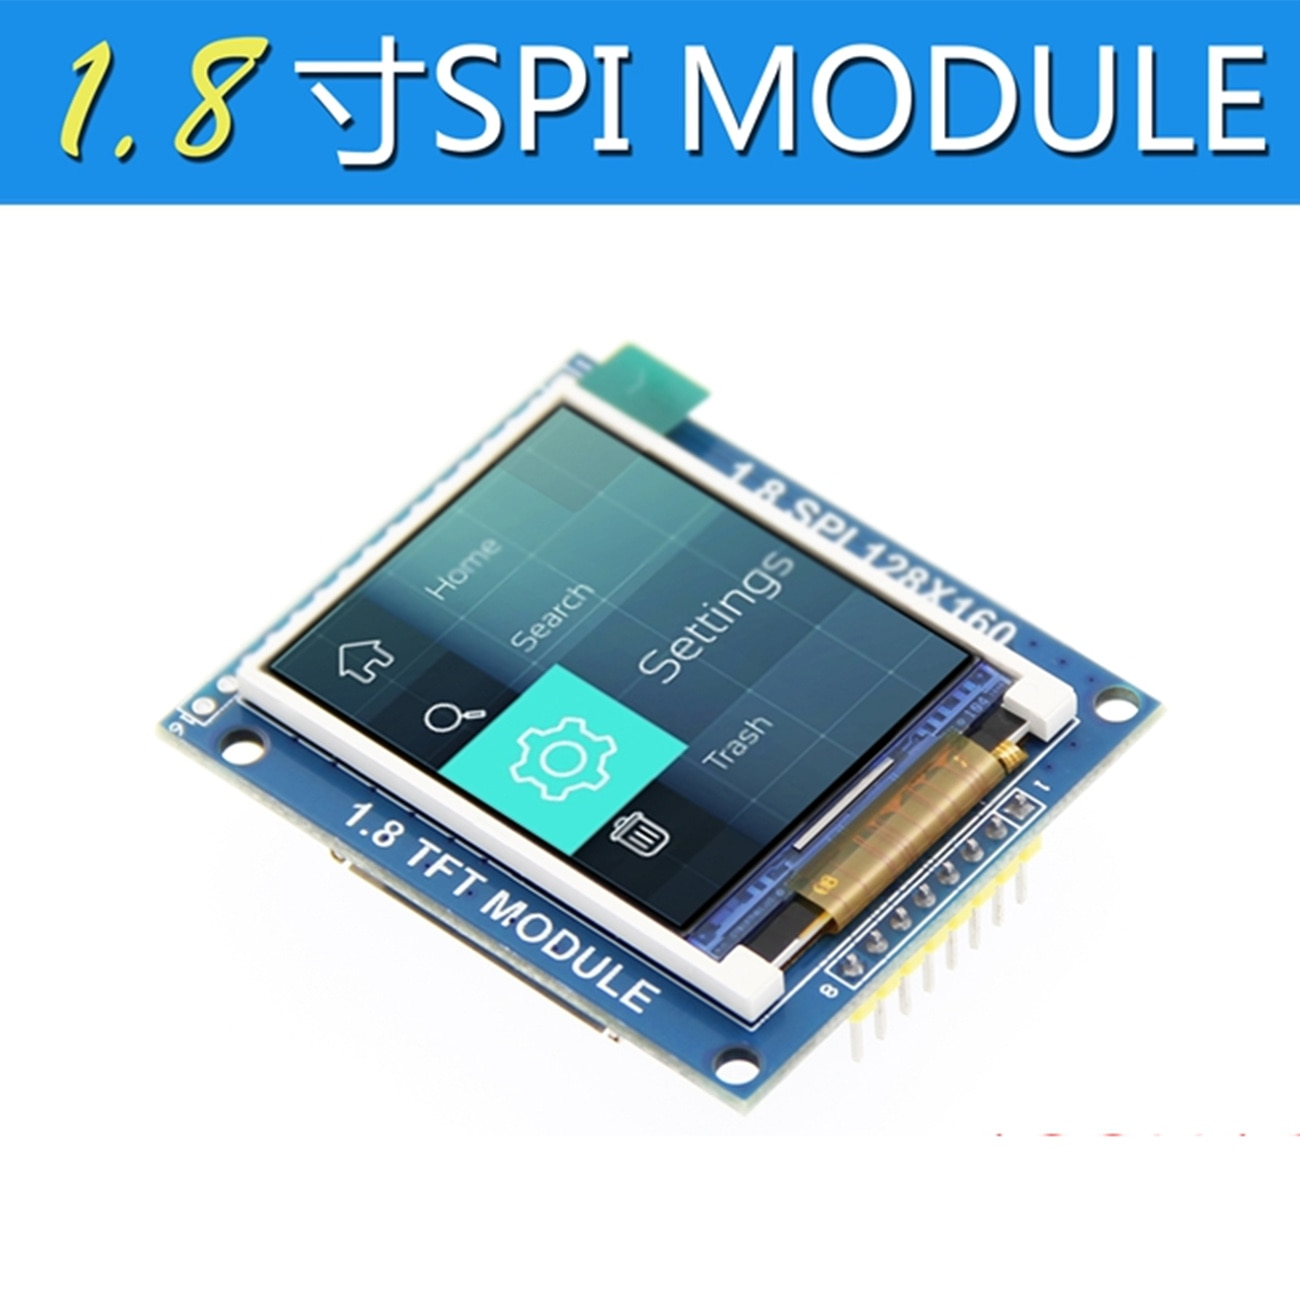 1,8 inch TFT LCD modul LCD screen modul ST7735 SPI serie 51 fahrer 4 IO fahrer TFT auflösung 128*160